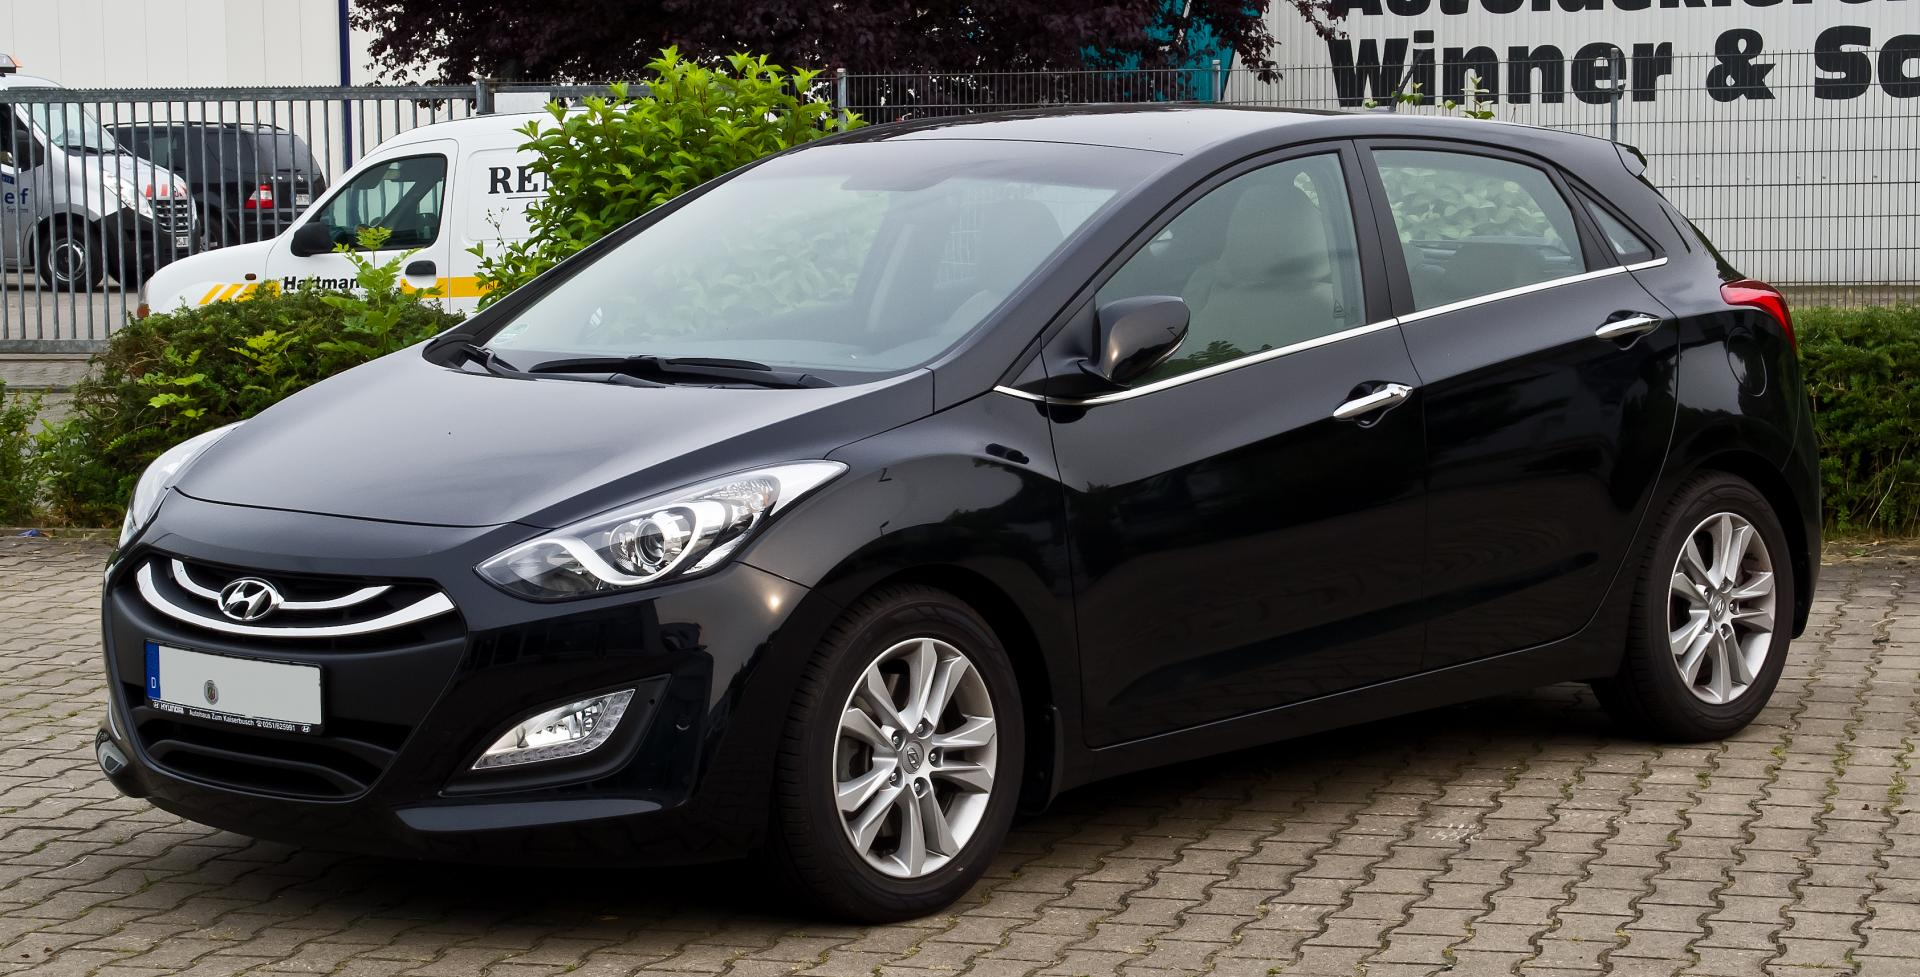 Hyundai i30 чёрного цвета, вид спереди